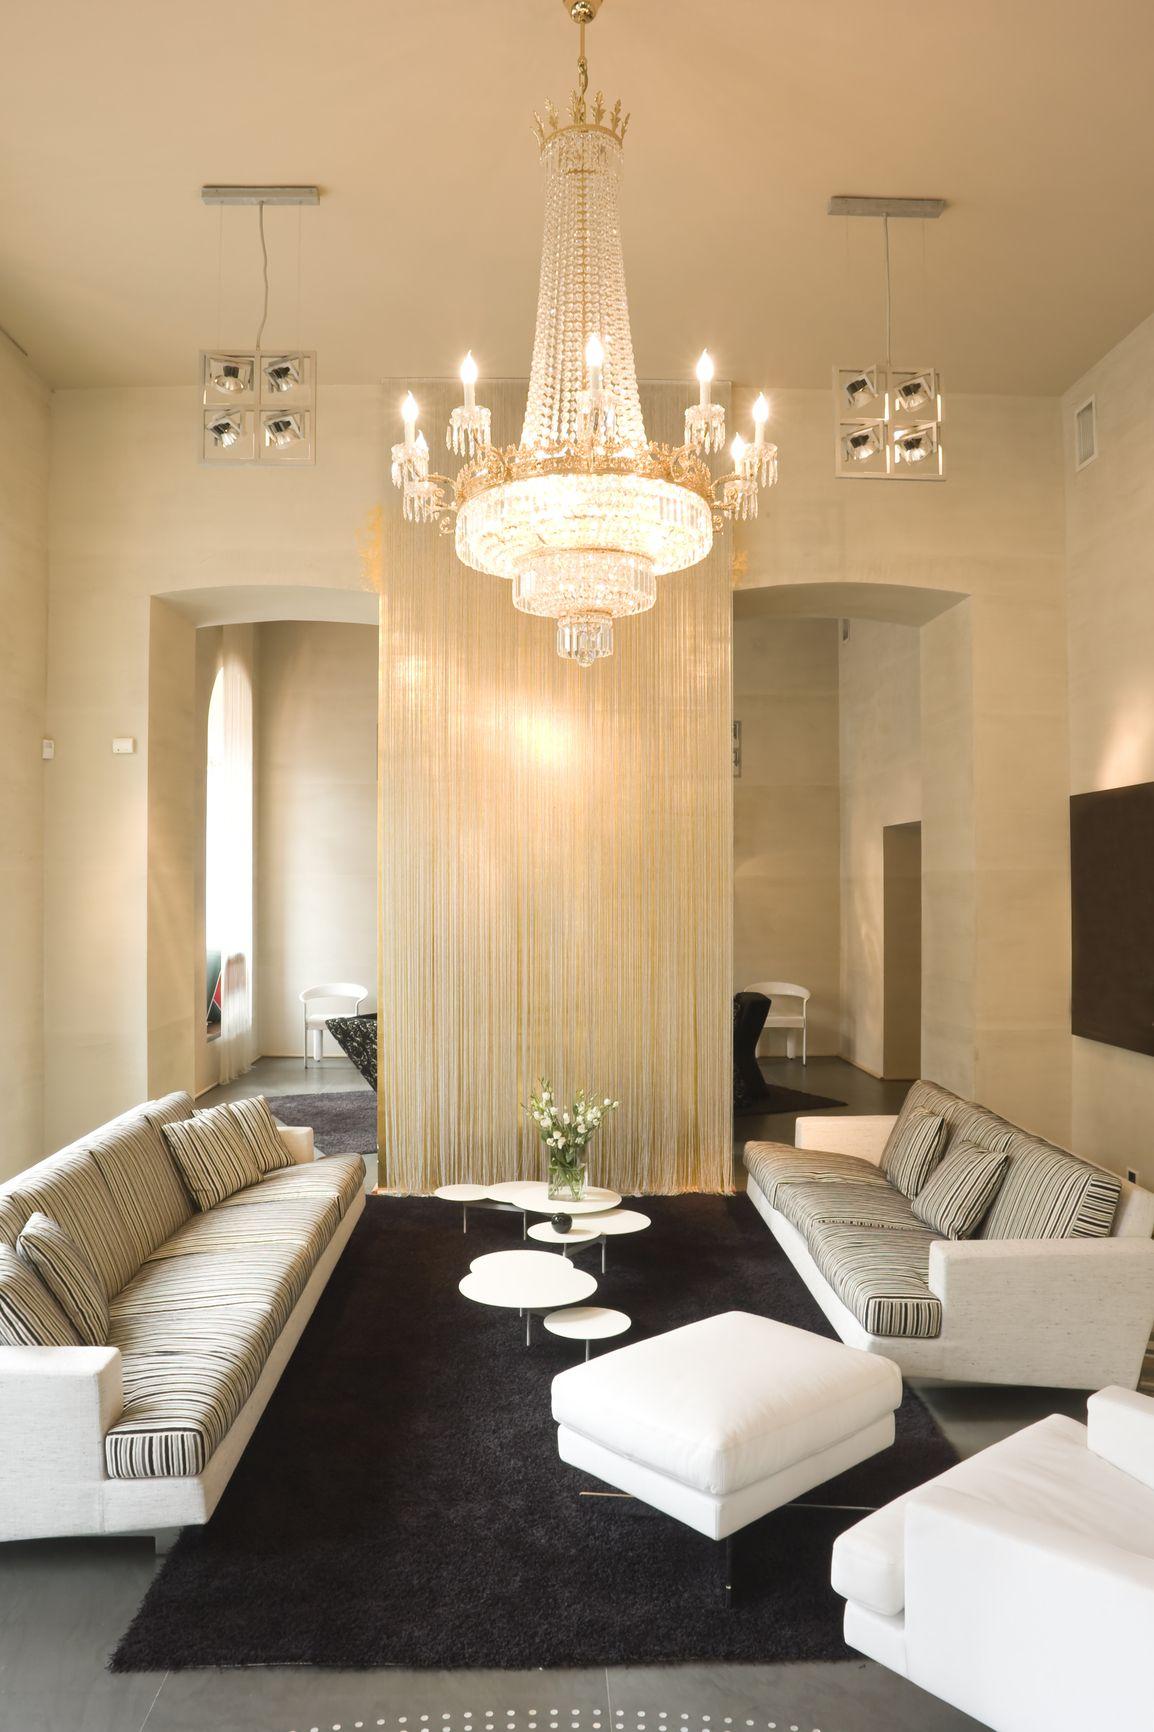 650 Formal Living Room Design Ideas for